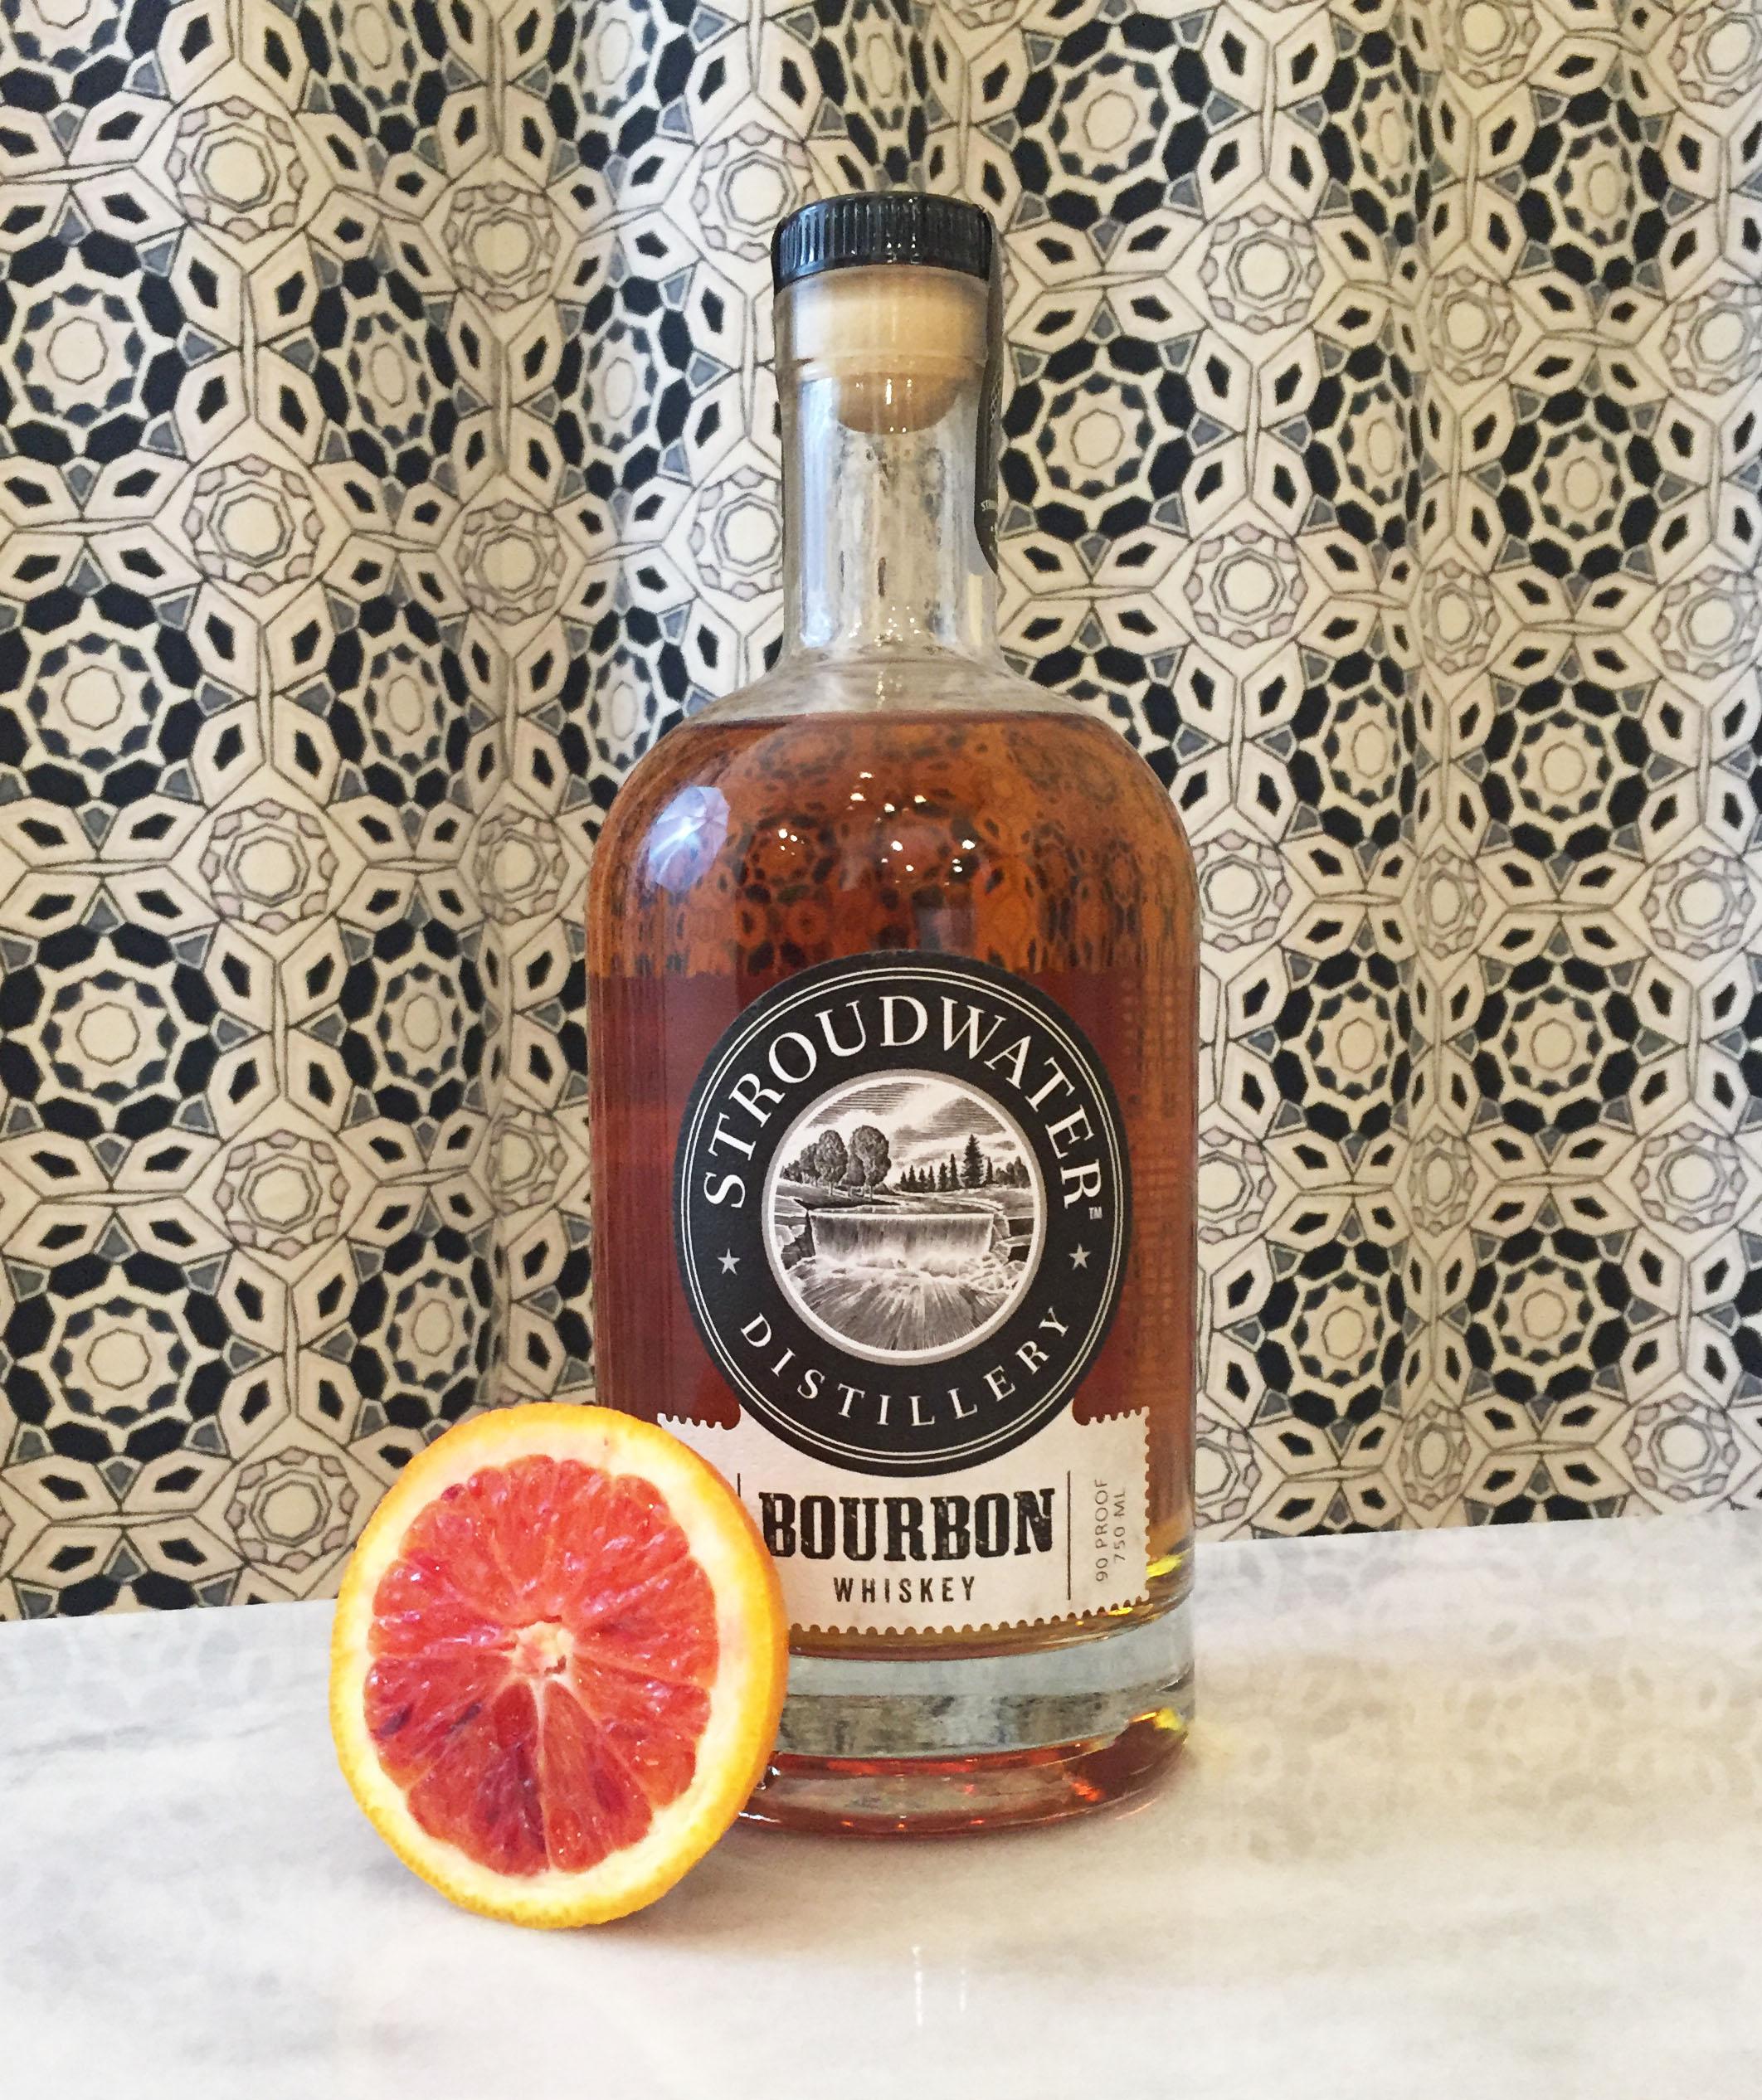 Stroudwater Distillary Bourbon